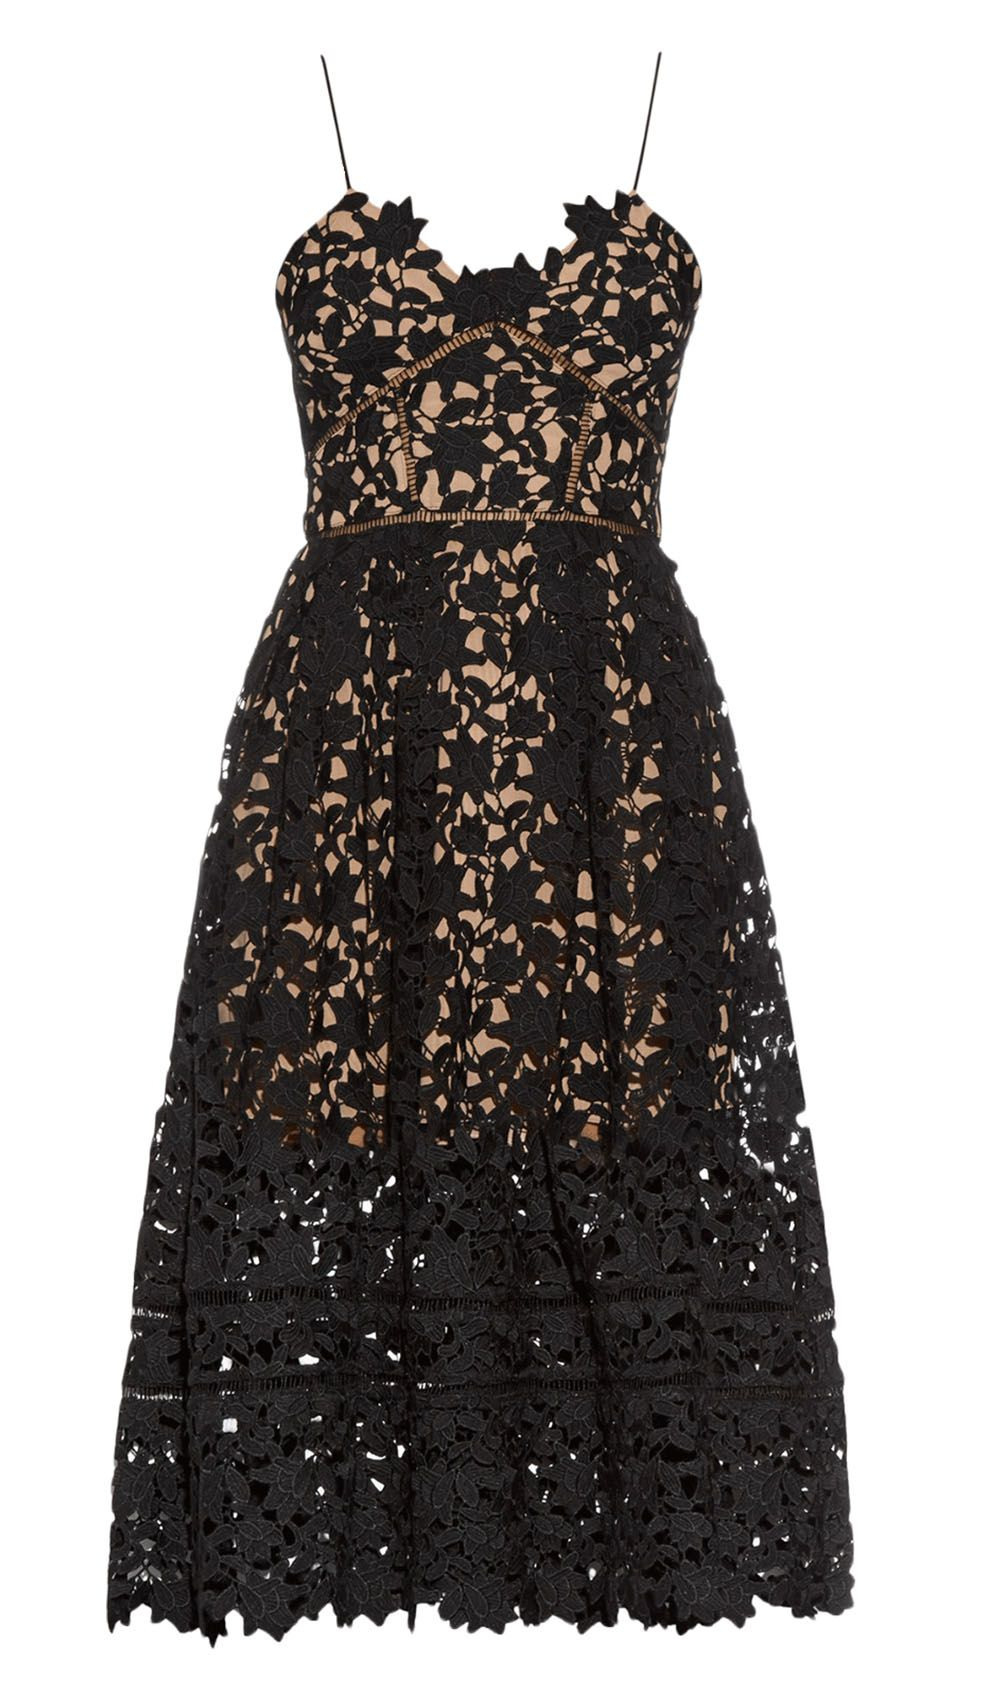 Self-Portrait Black Lace Midi Dress  Designer Kleider - Abendkleid Handy